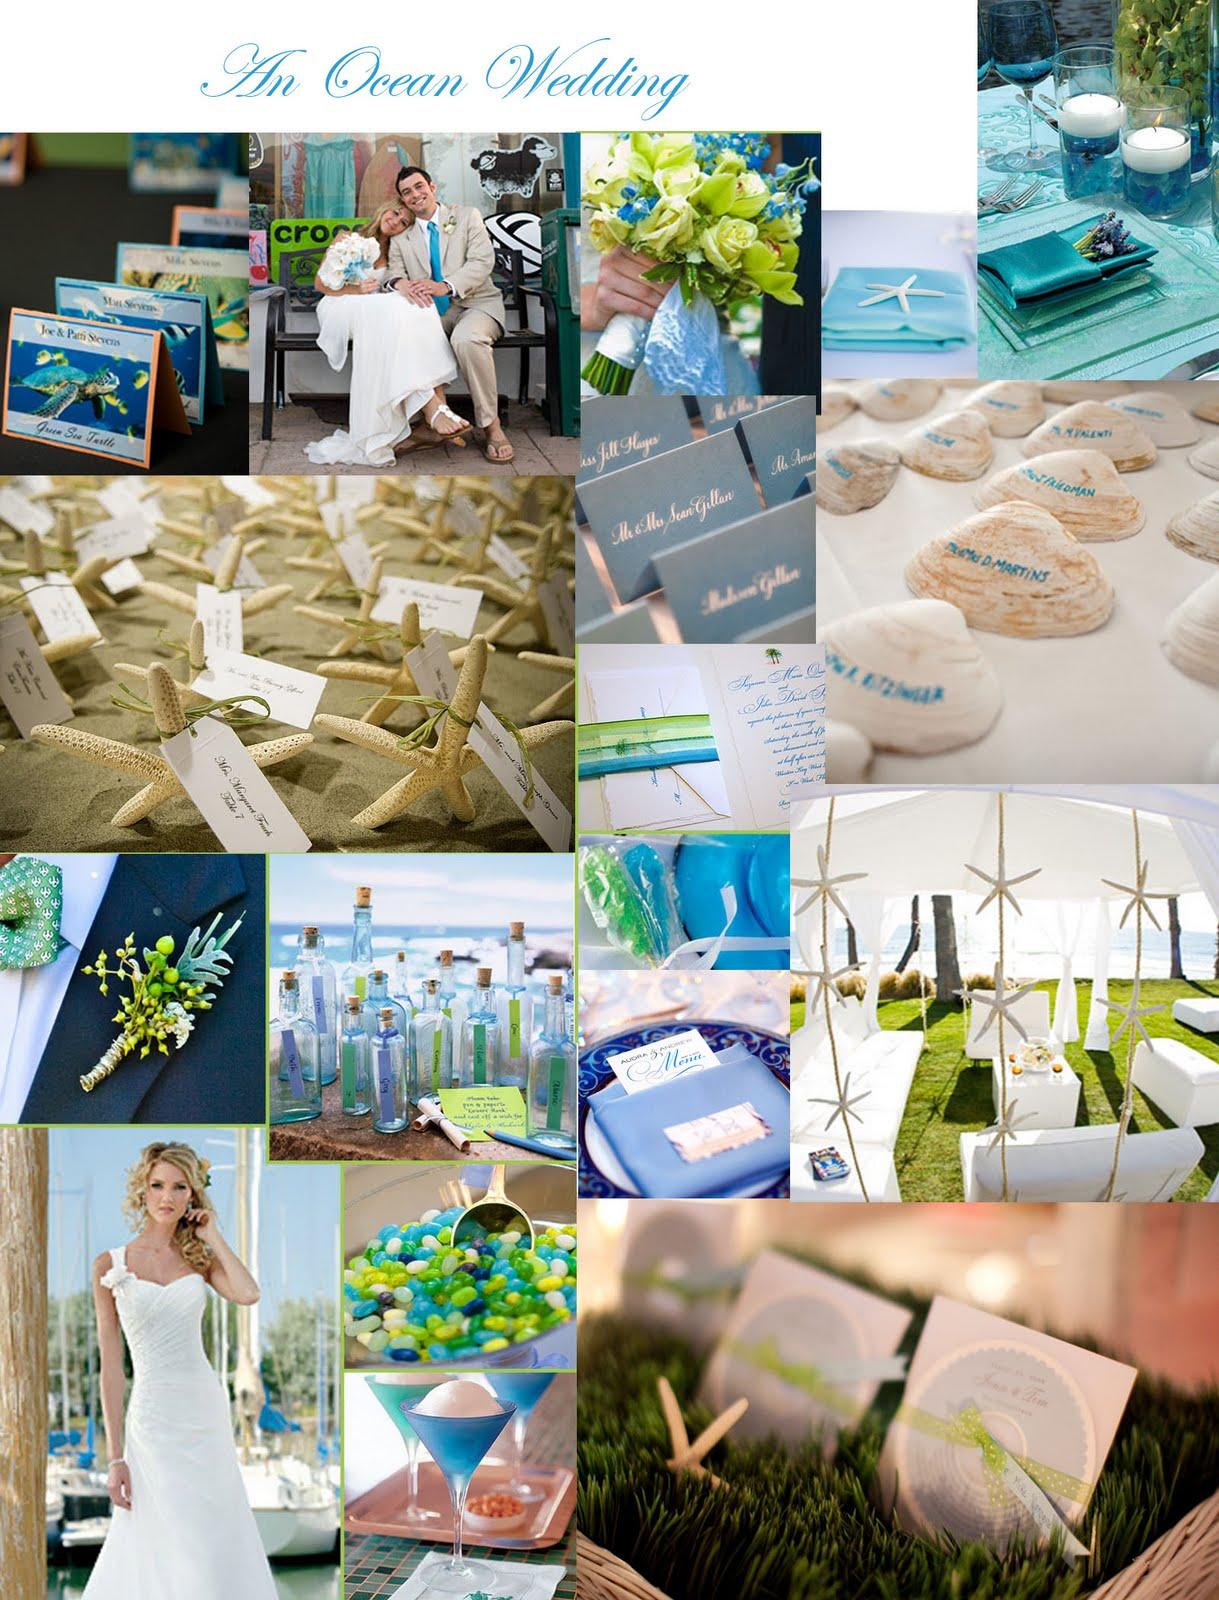 Ocean Wedding Decoration Ideas : Wedding decorations under the sea theme